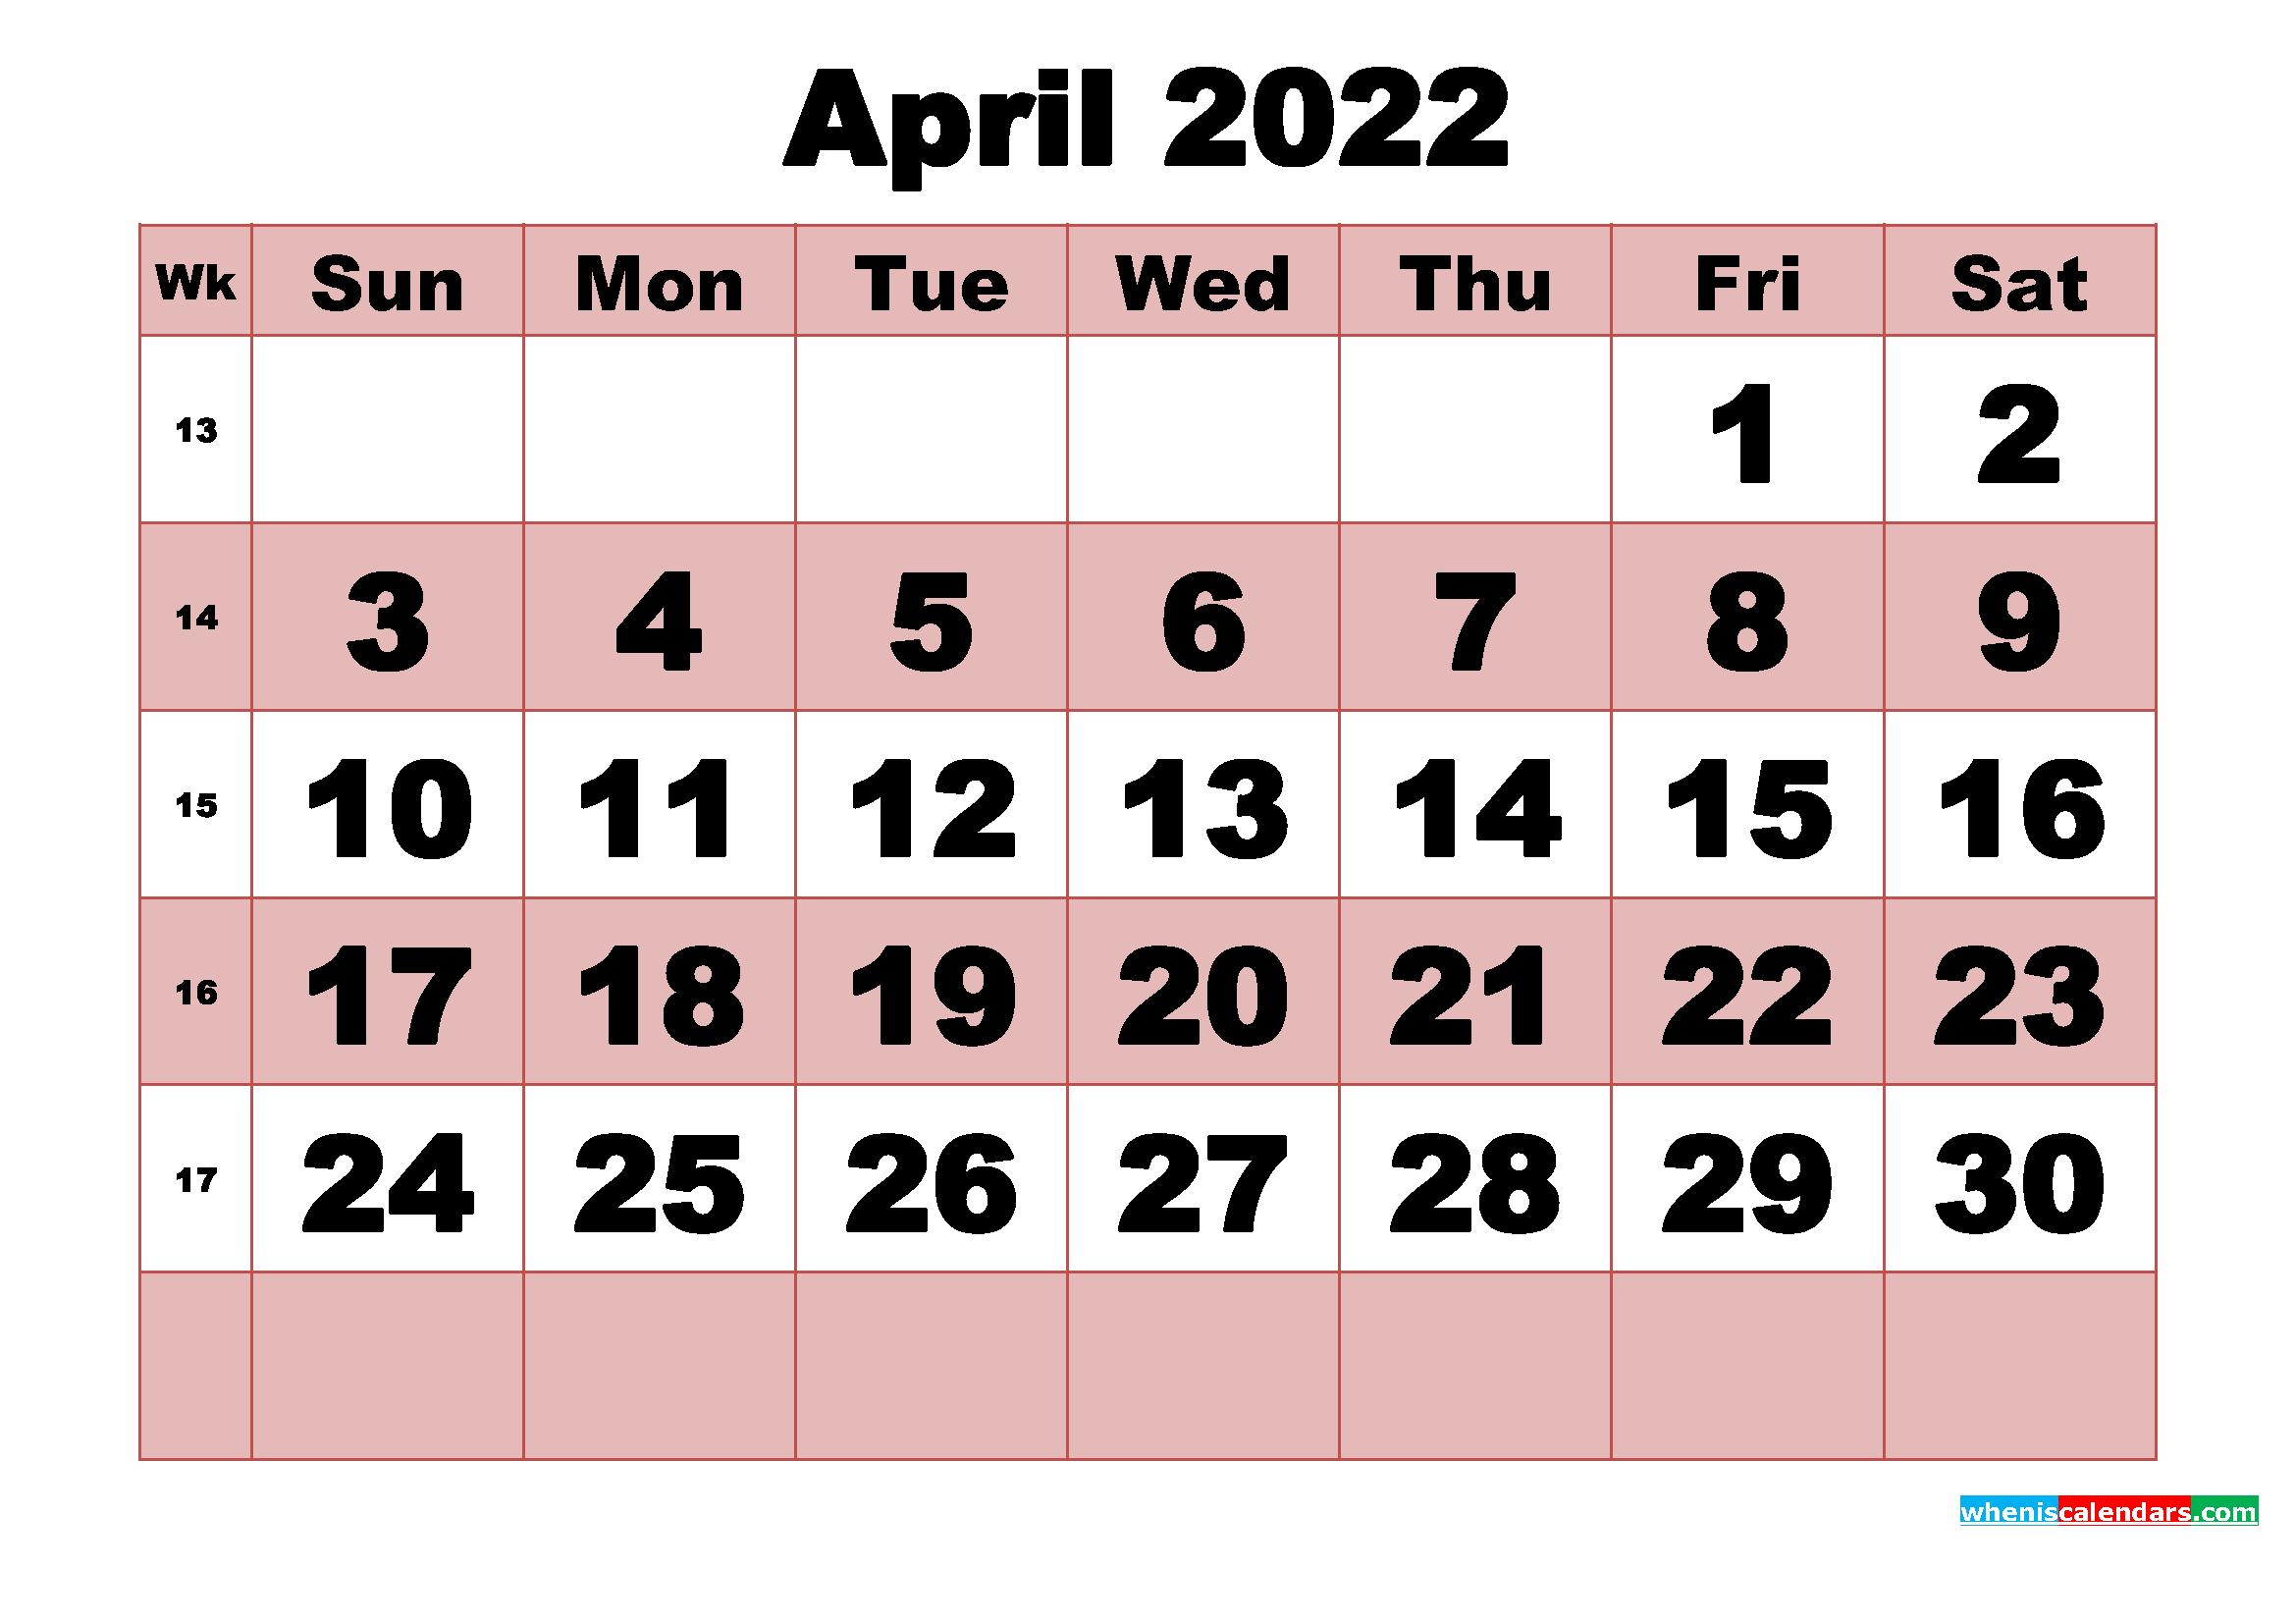 Free Printable Monthly Calendar April 2022 throughout April 2022 Printable Calendar Free 2022 Graphics